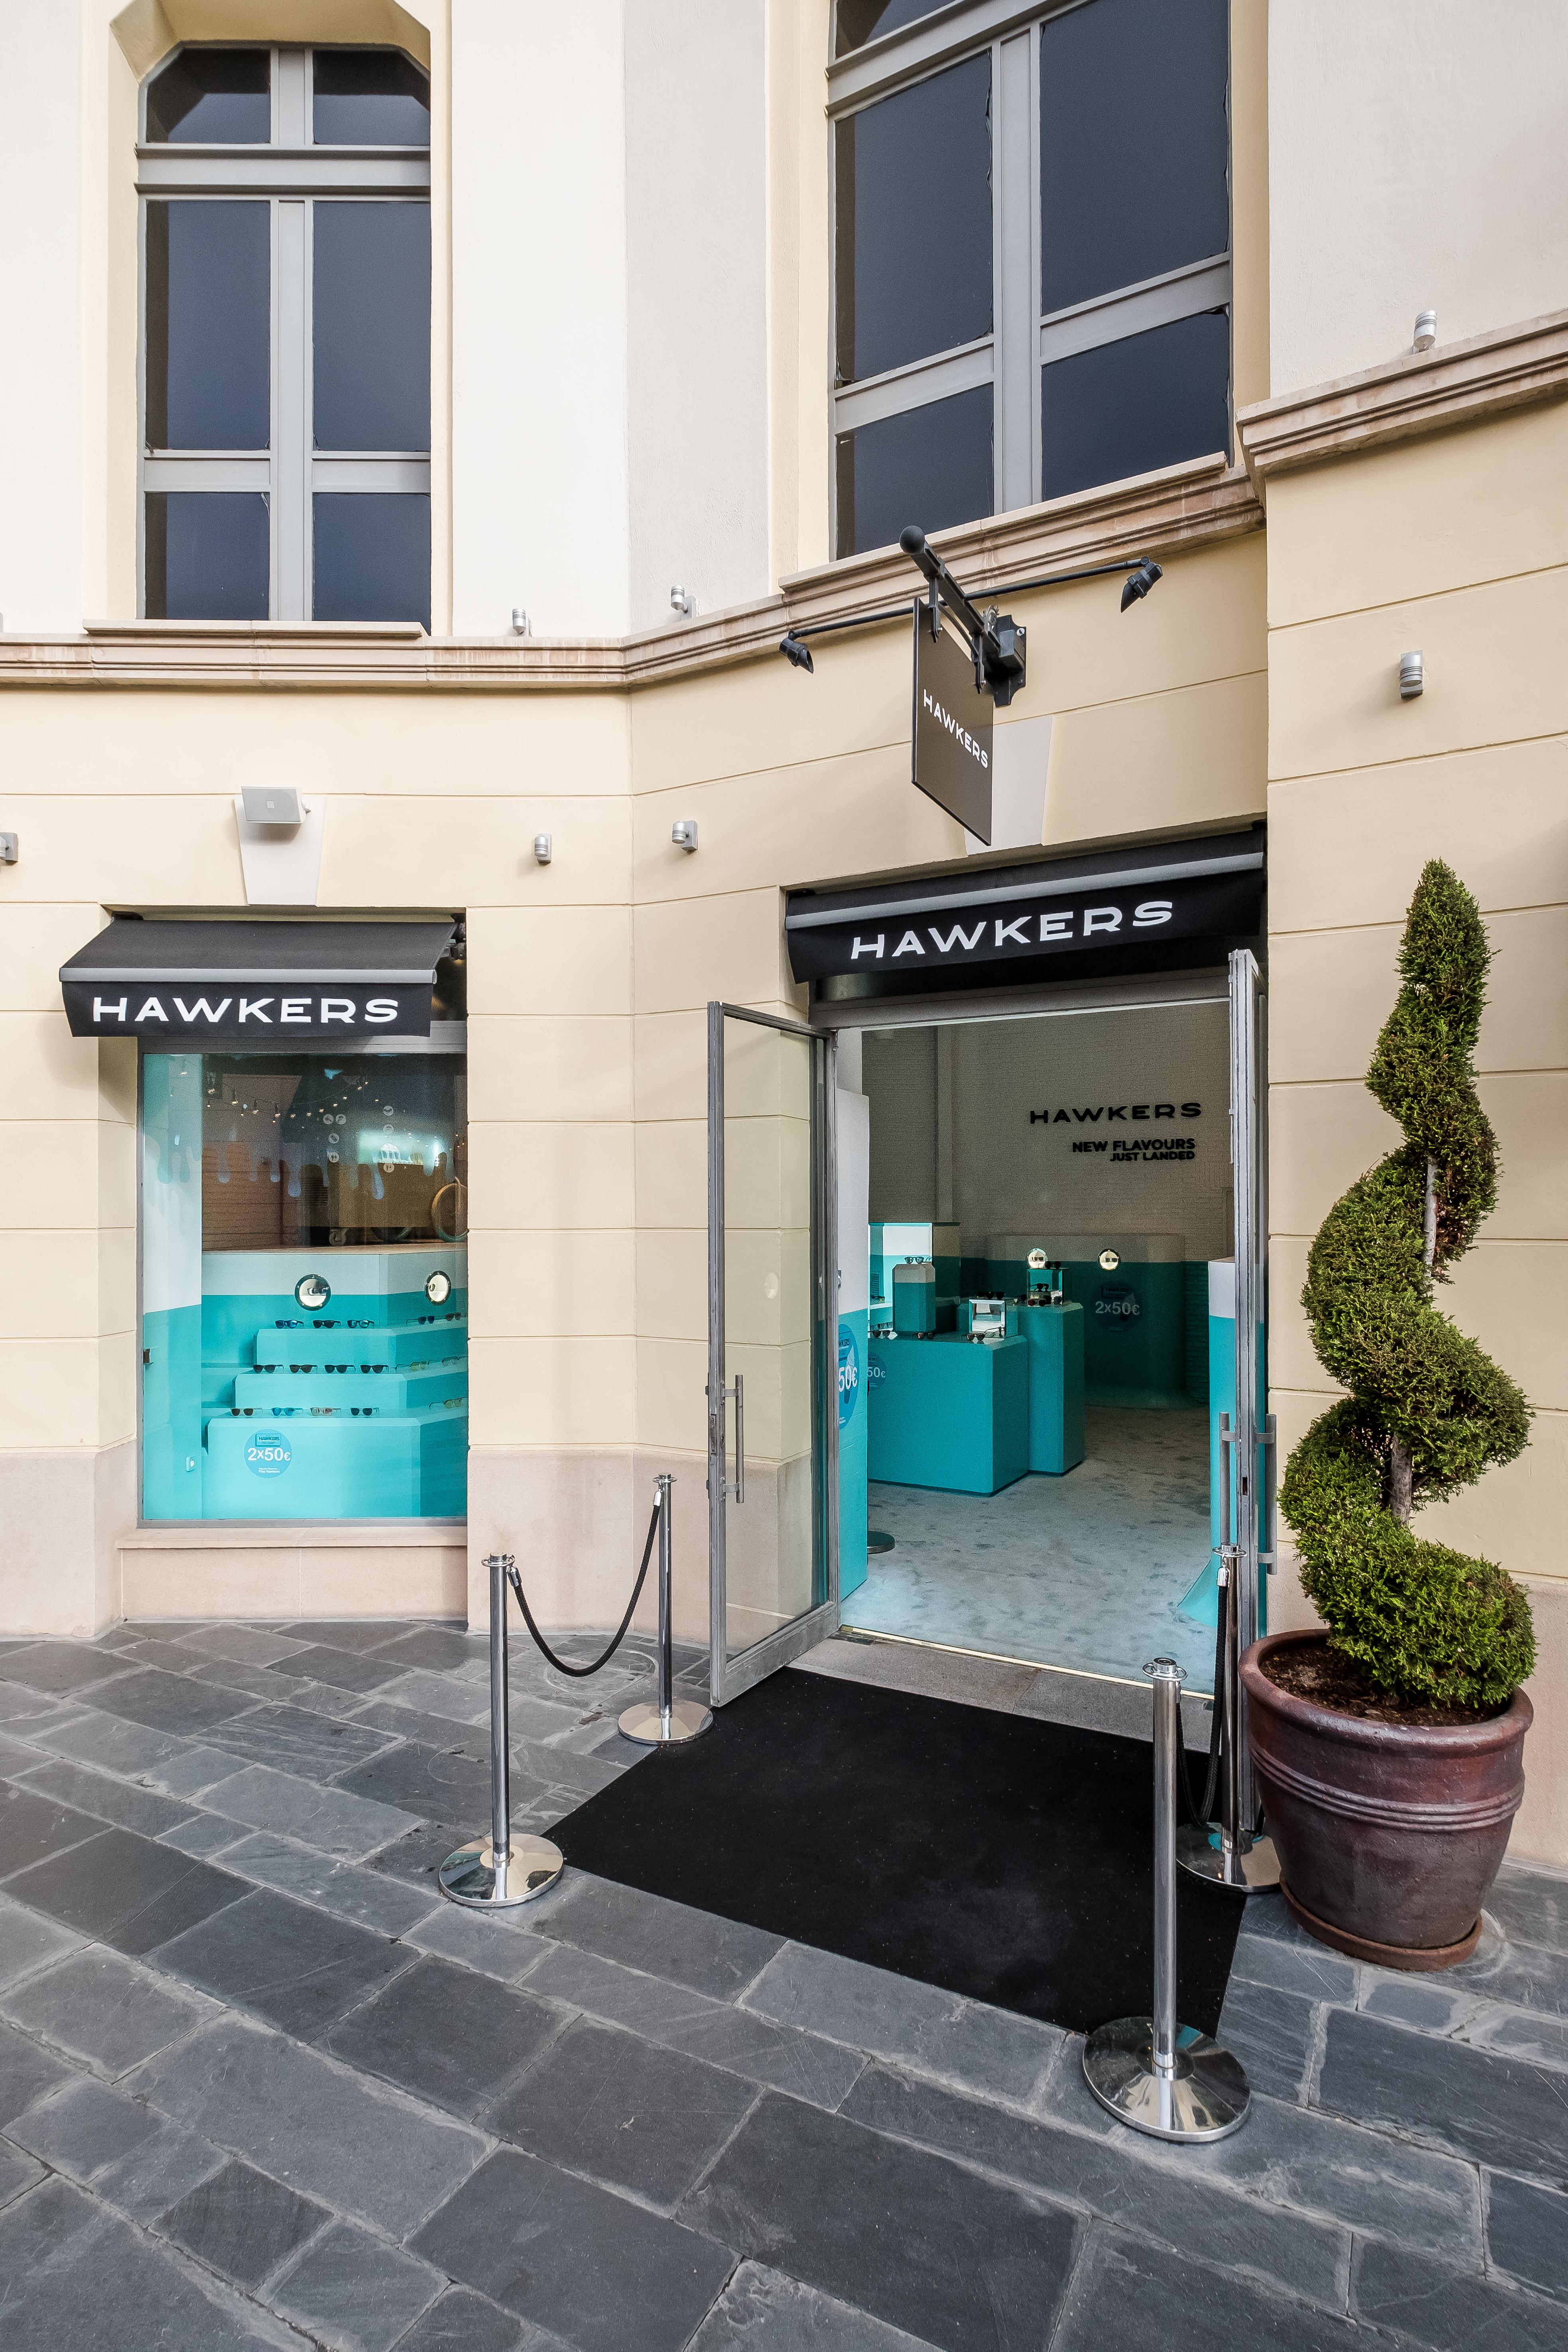 hawkers-madrid-lasrozasvillage_davidgarmen-005